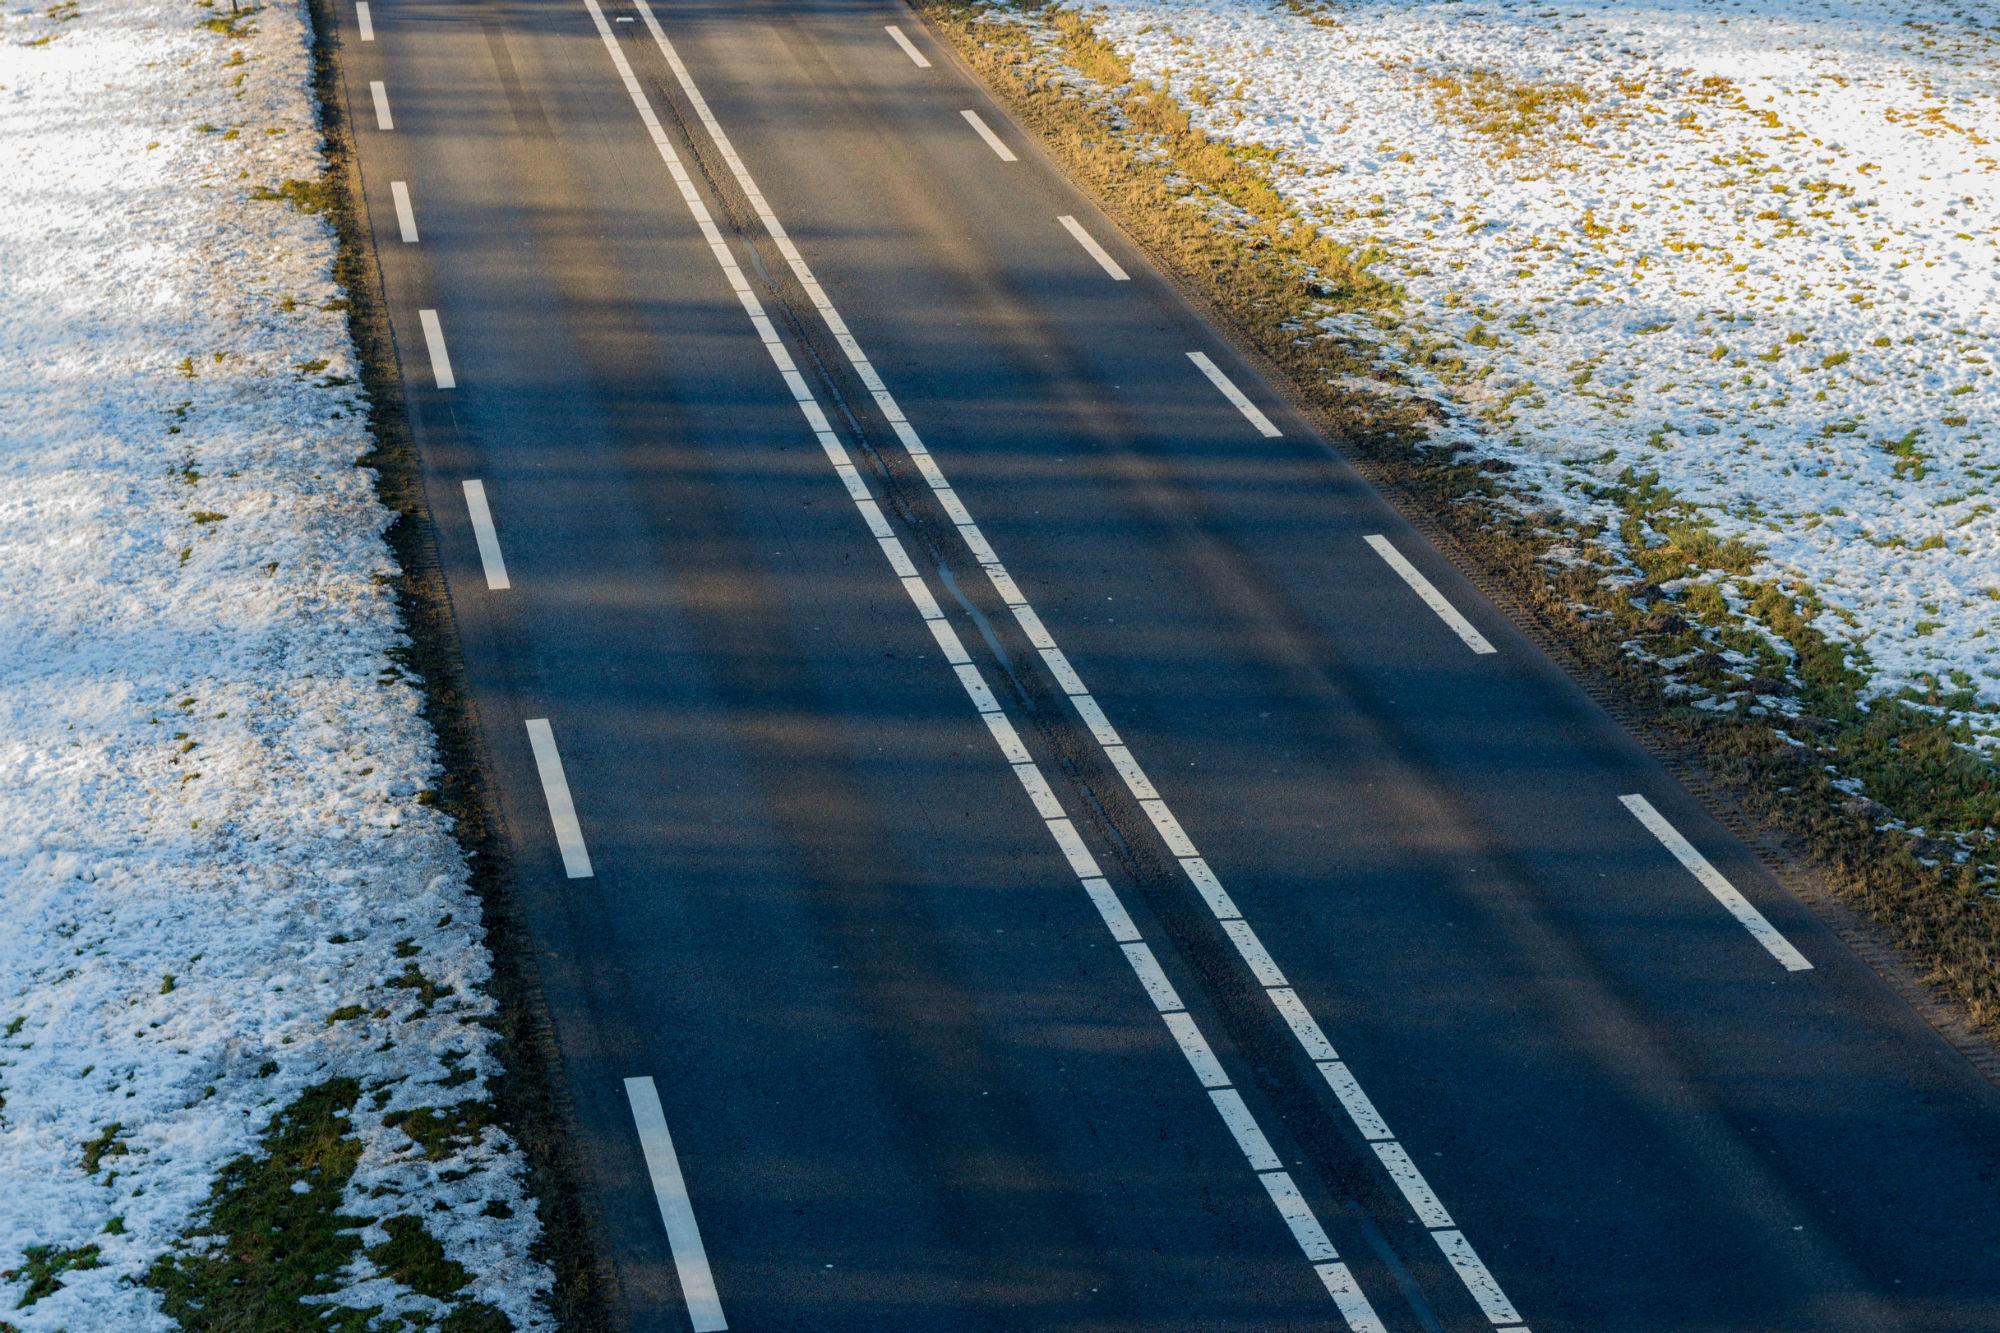 Dutch Highway for an International Drivers Permit